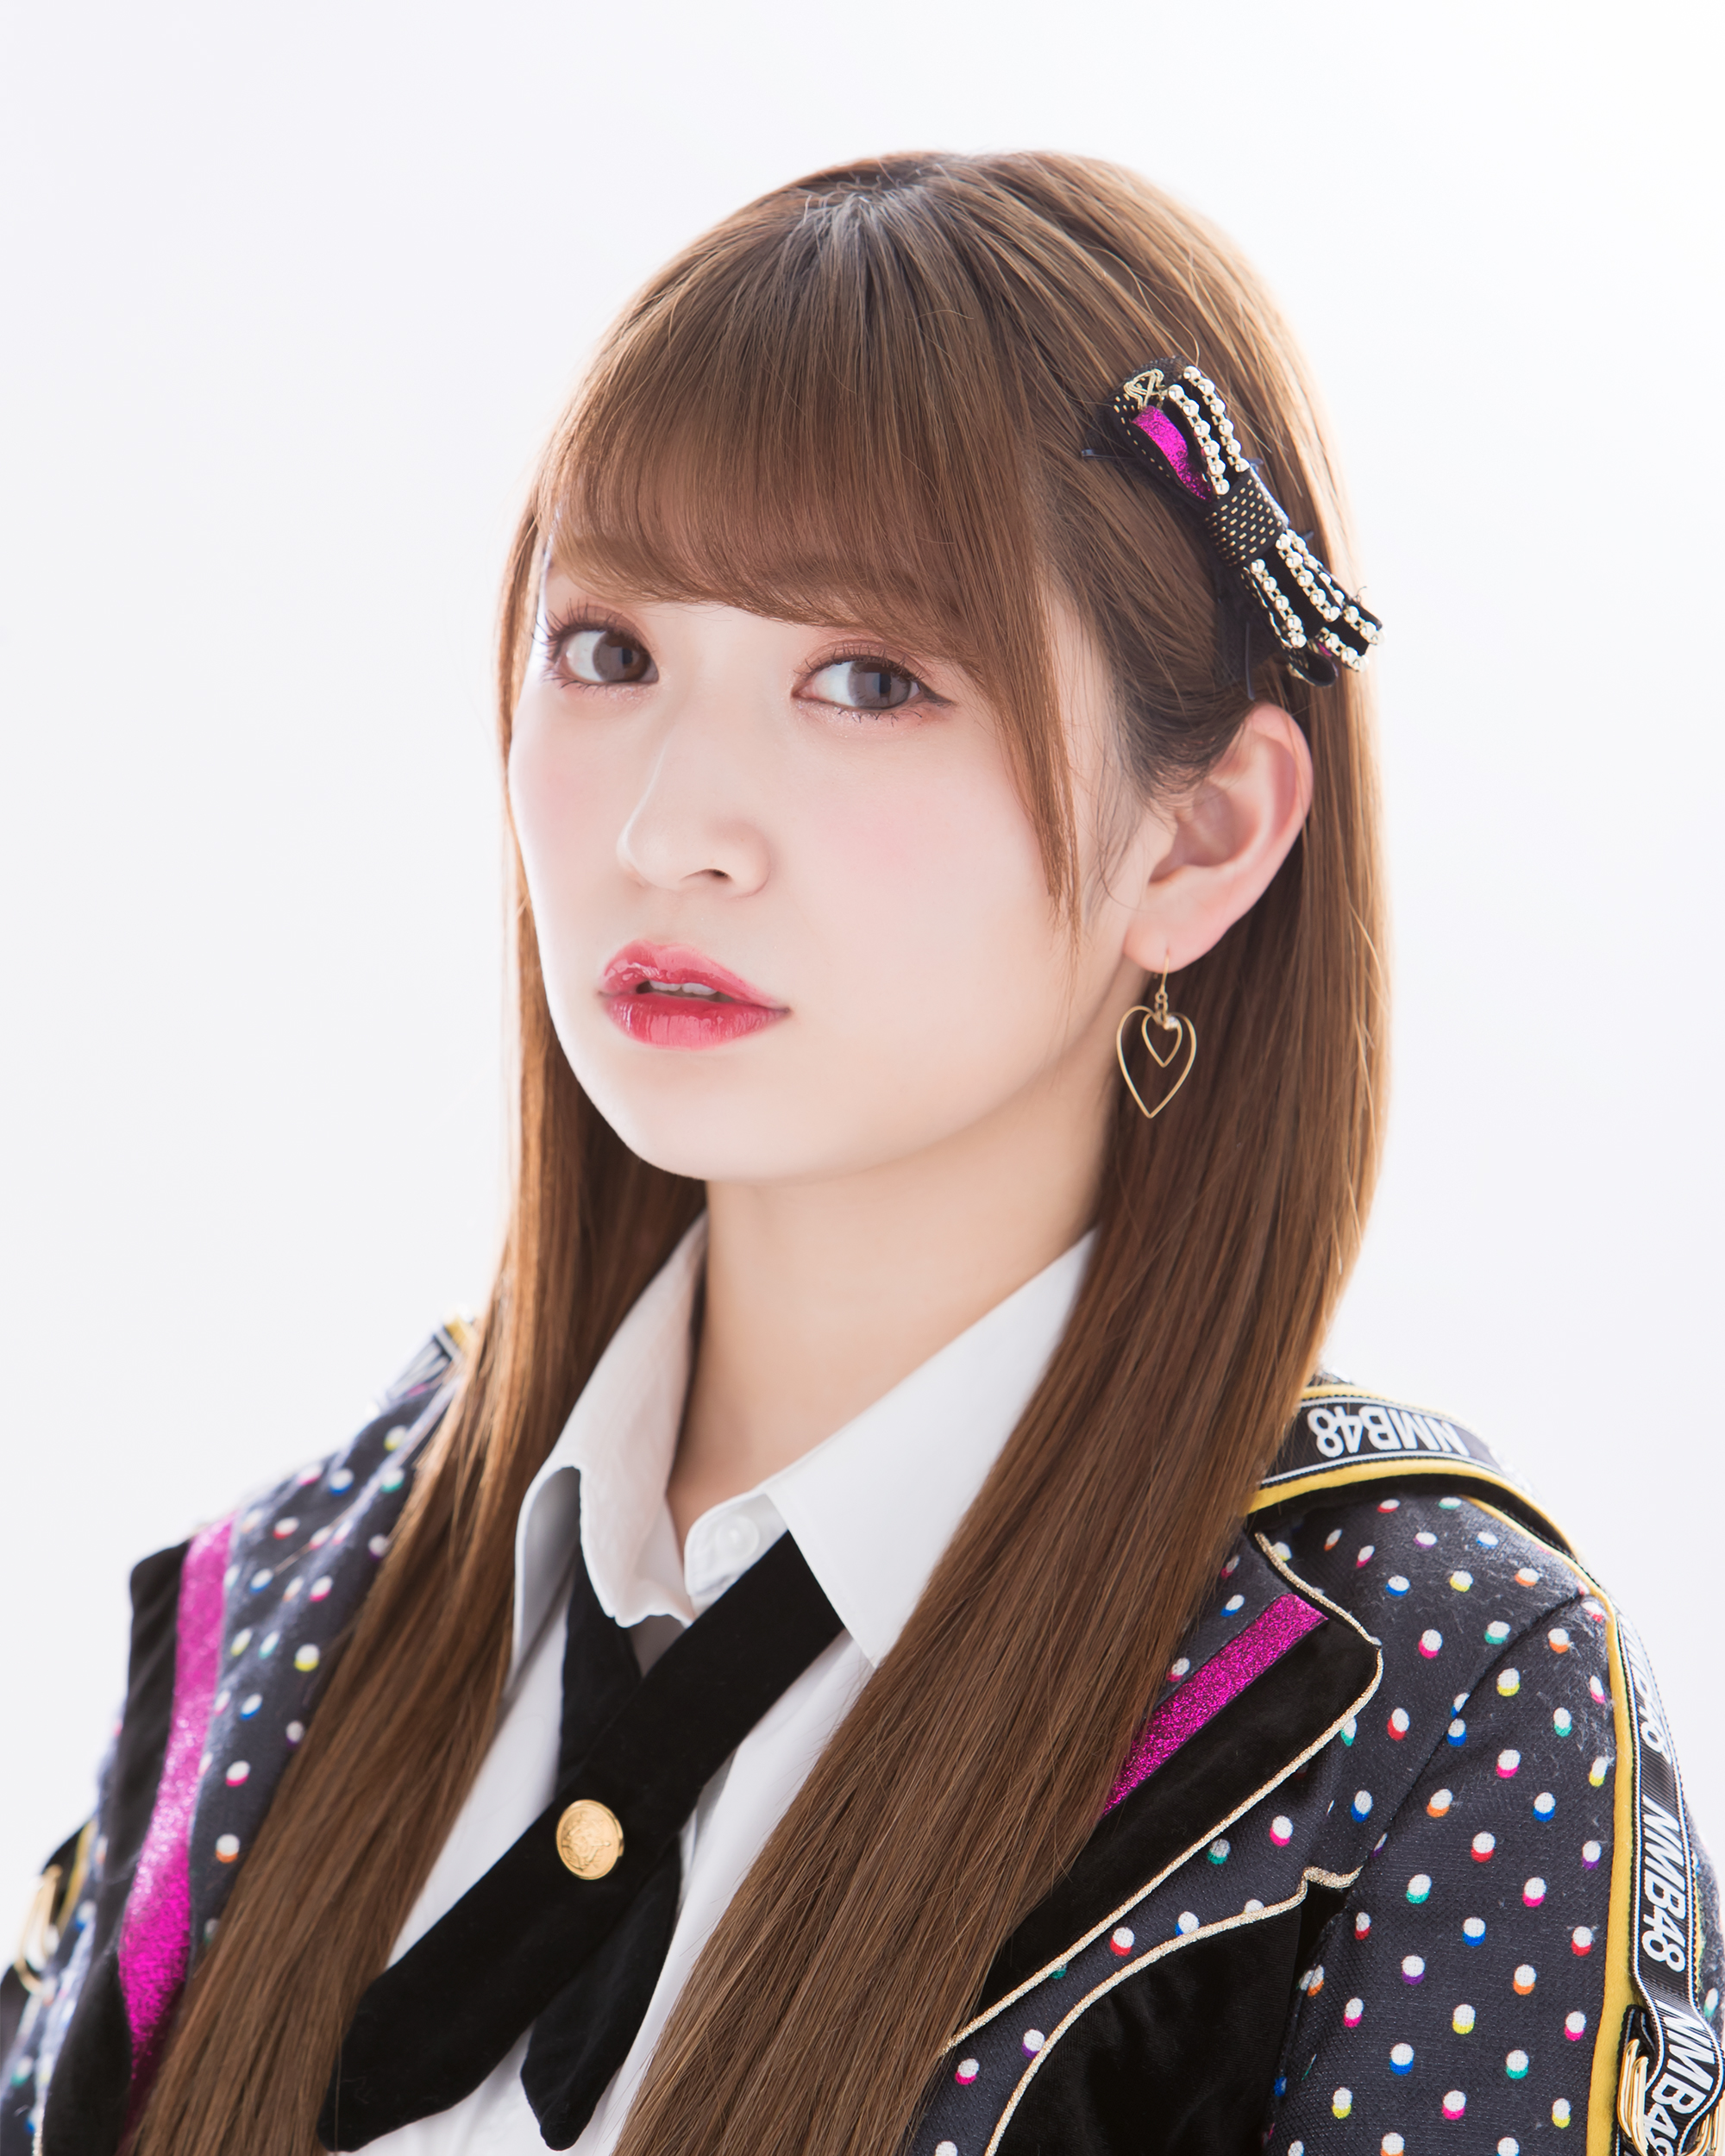 吉田朱里(NMB48 Team N)